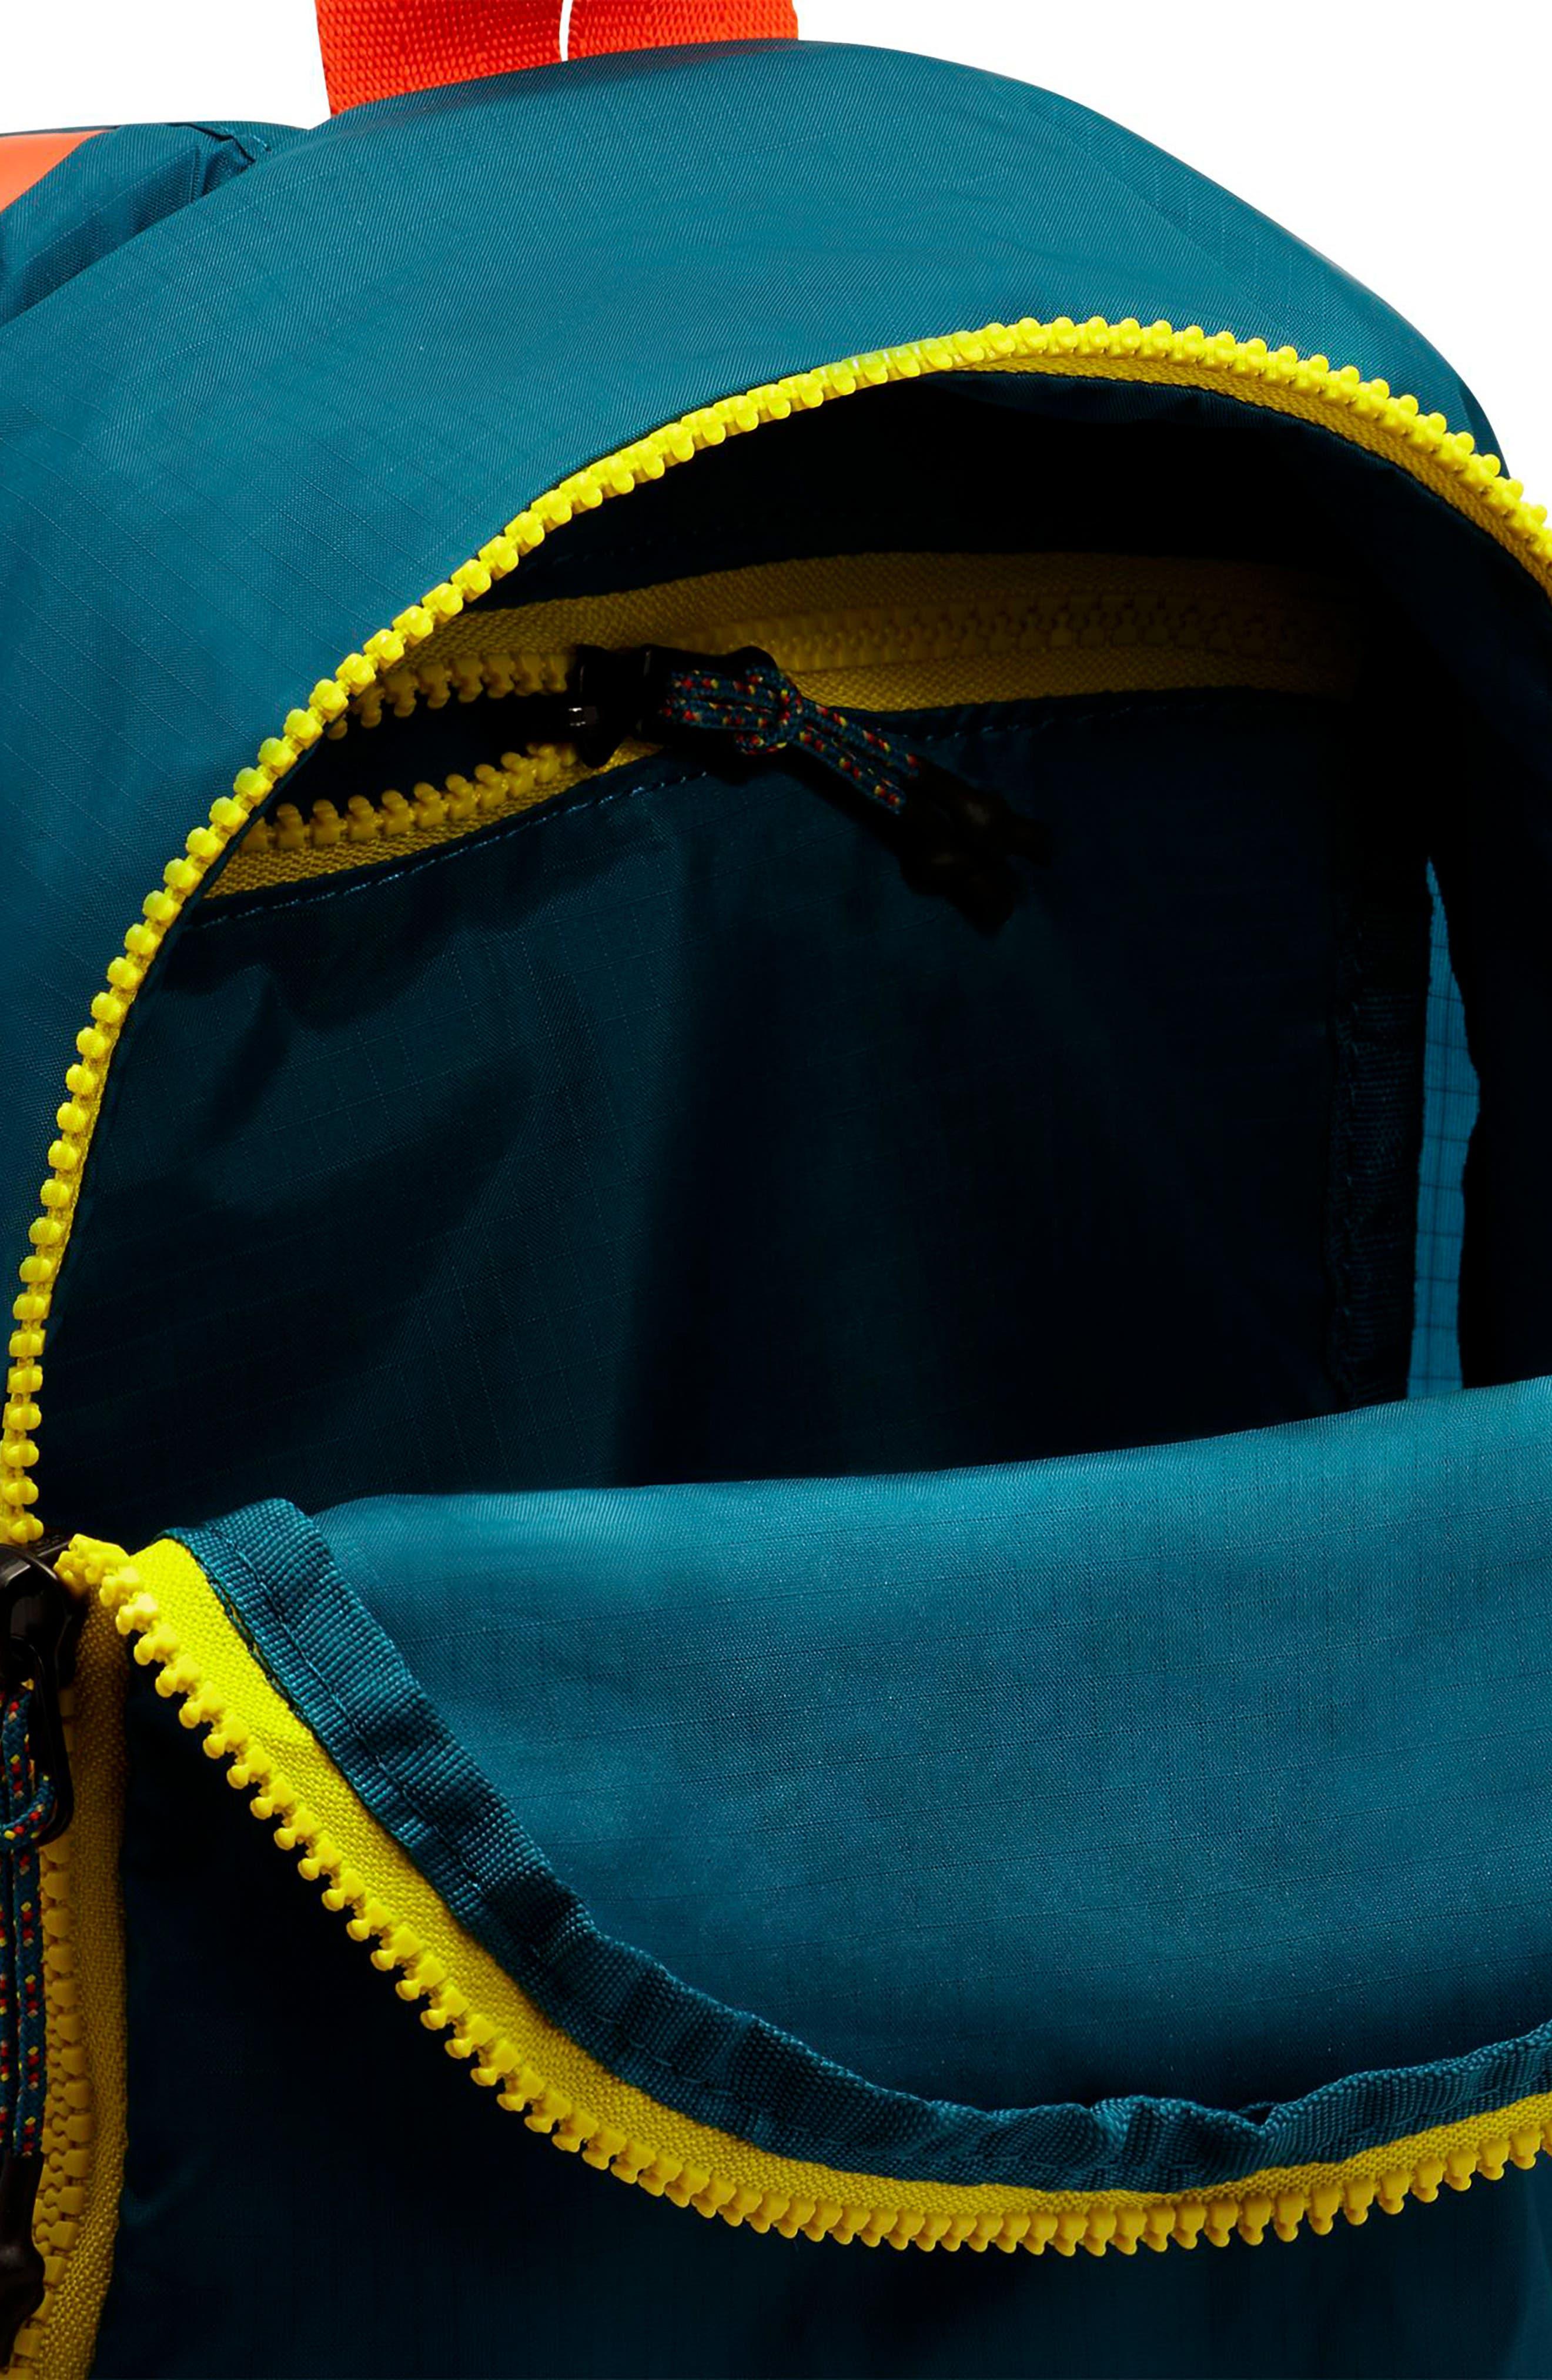 ACG Packable Backpack,                             Alternate thumbnail 3, color,                             GEODE TEAL/ GEODE TEAL